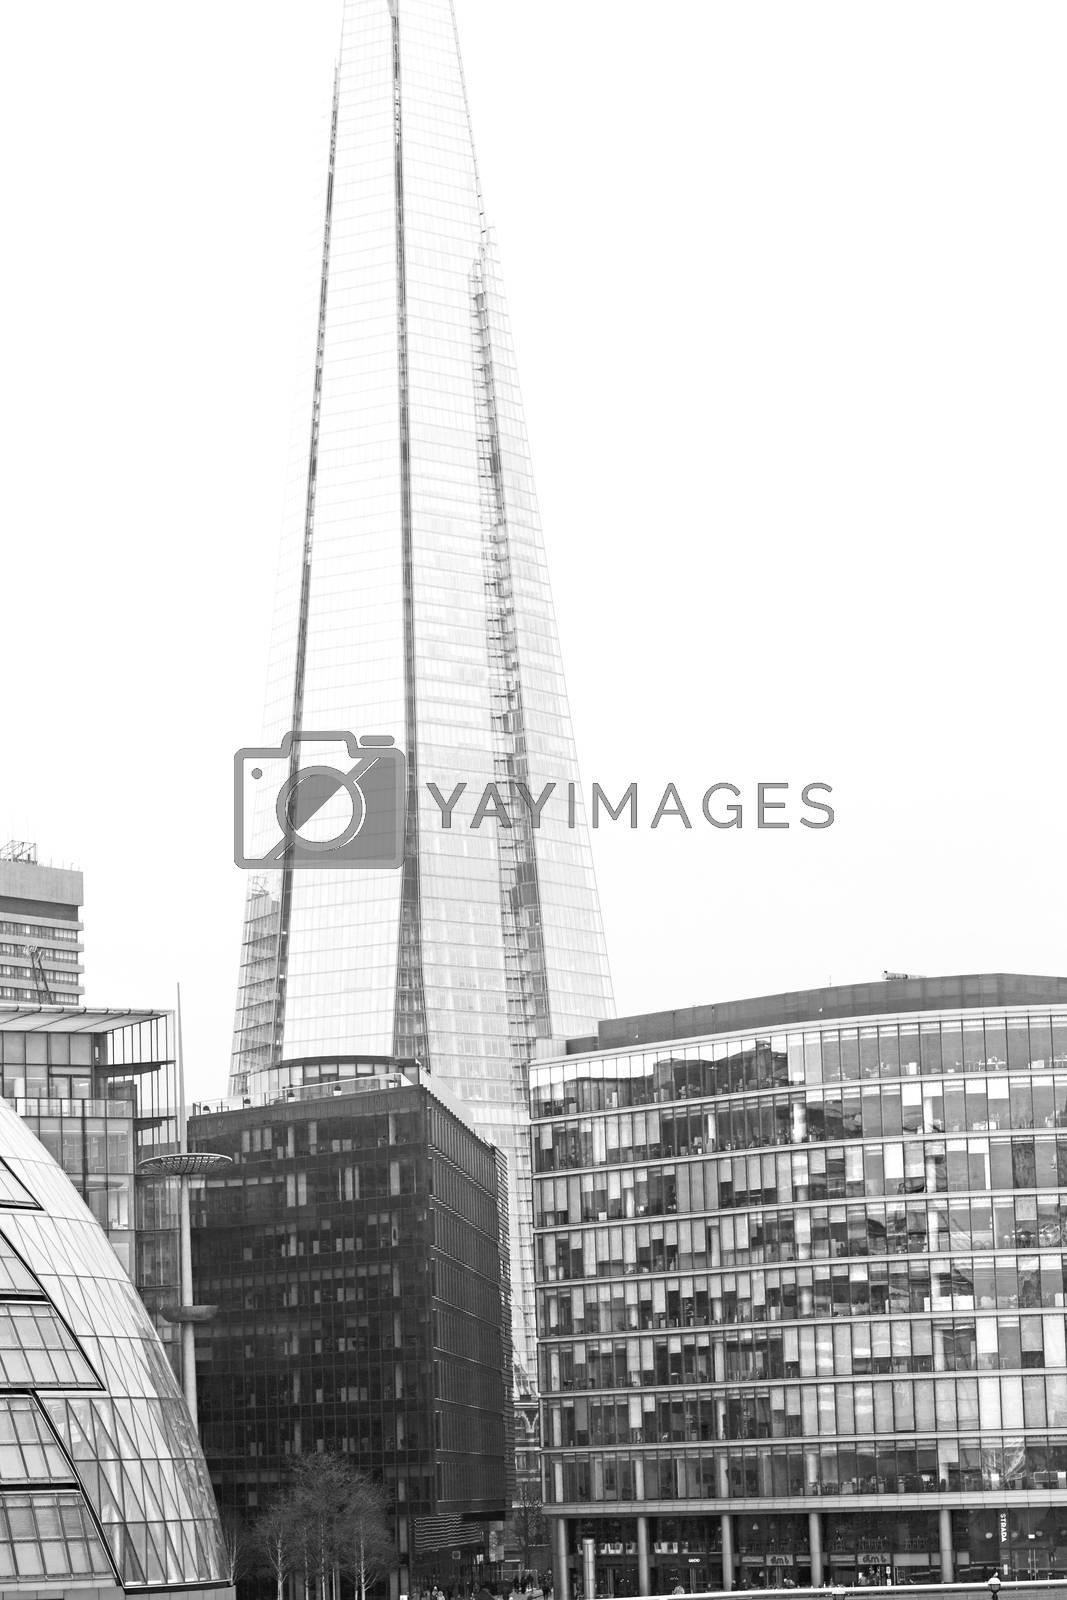 new     building in london skyscraper      financial district an by lkpro